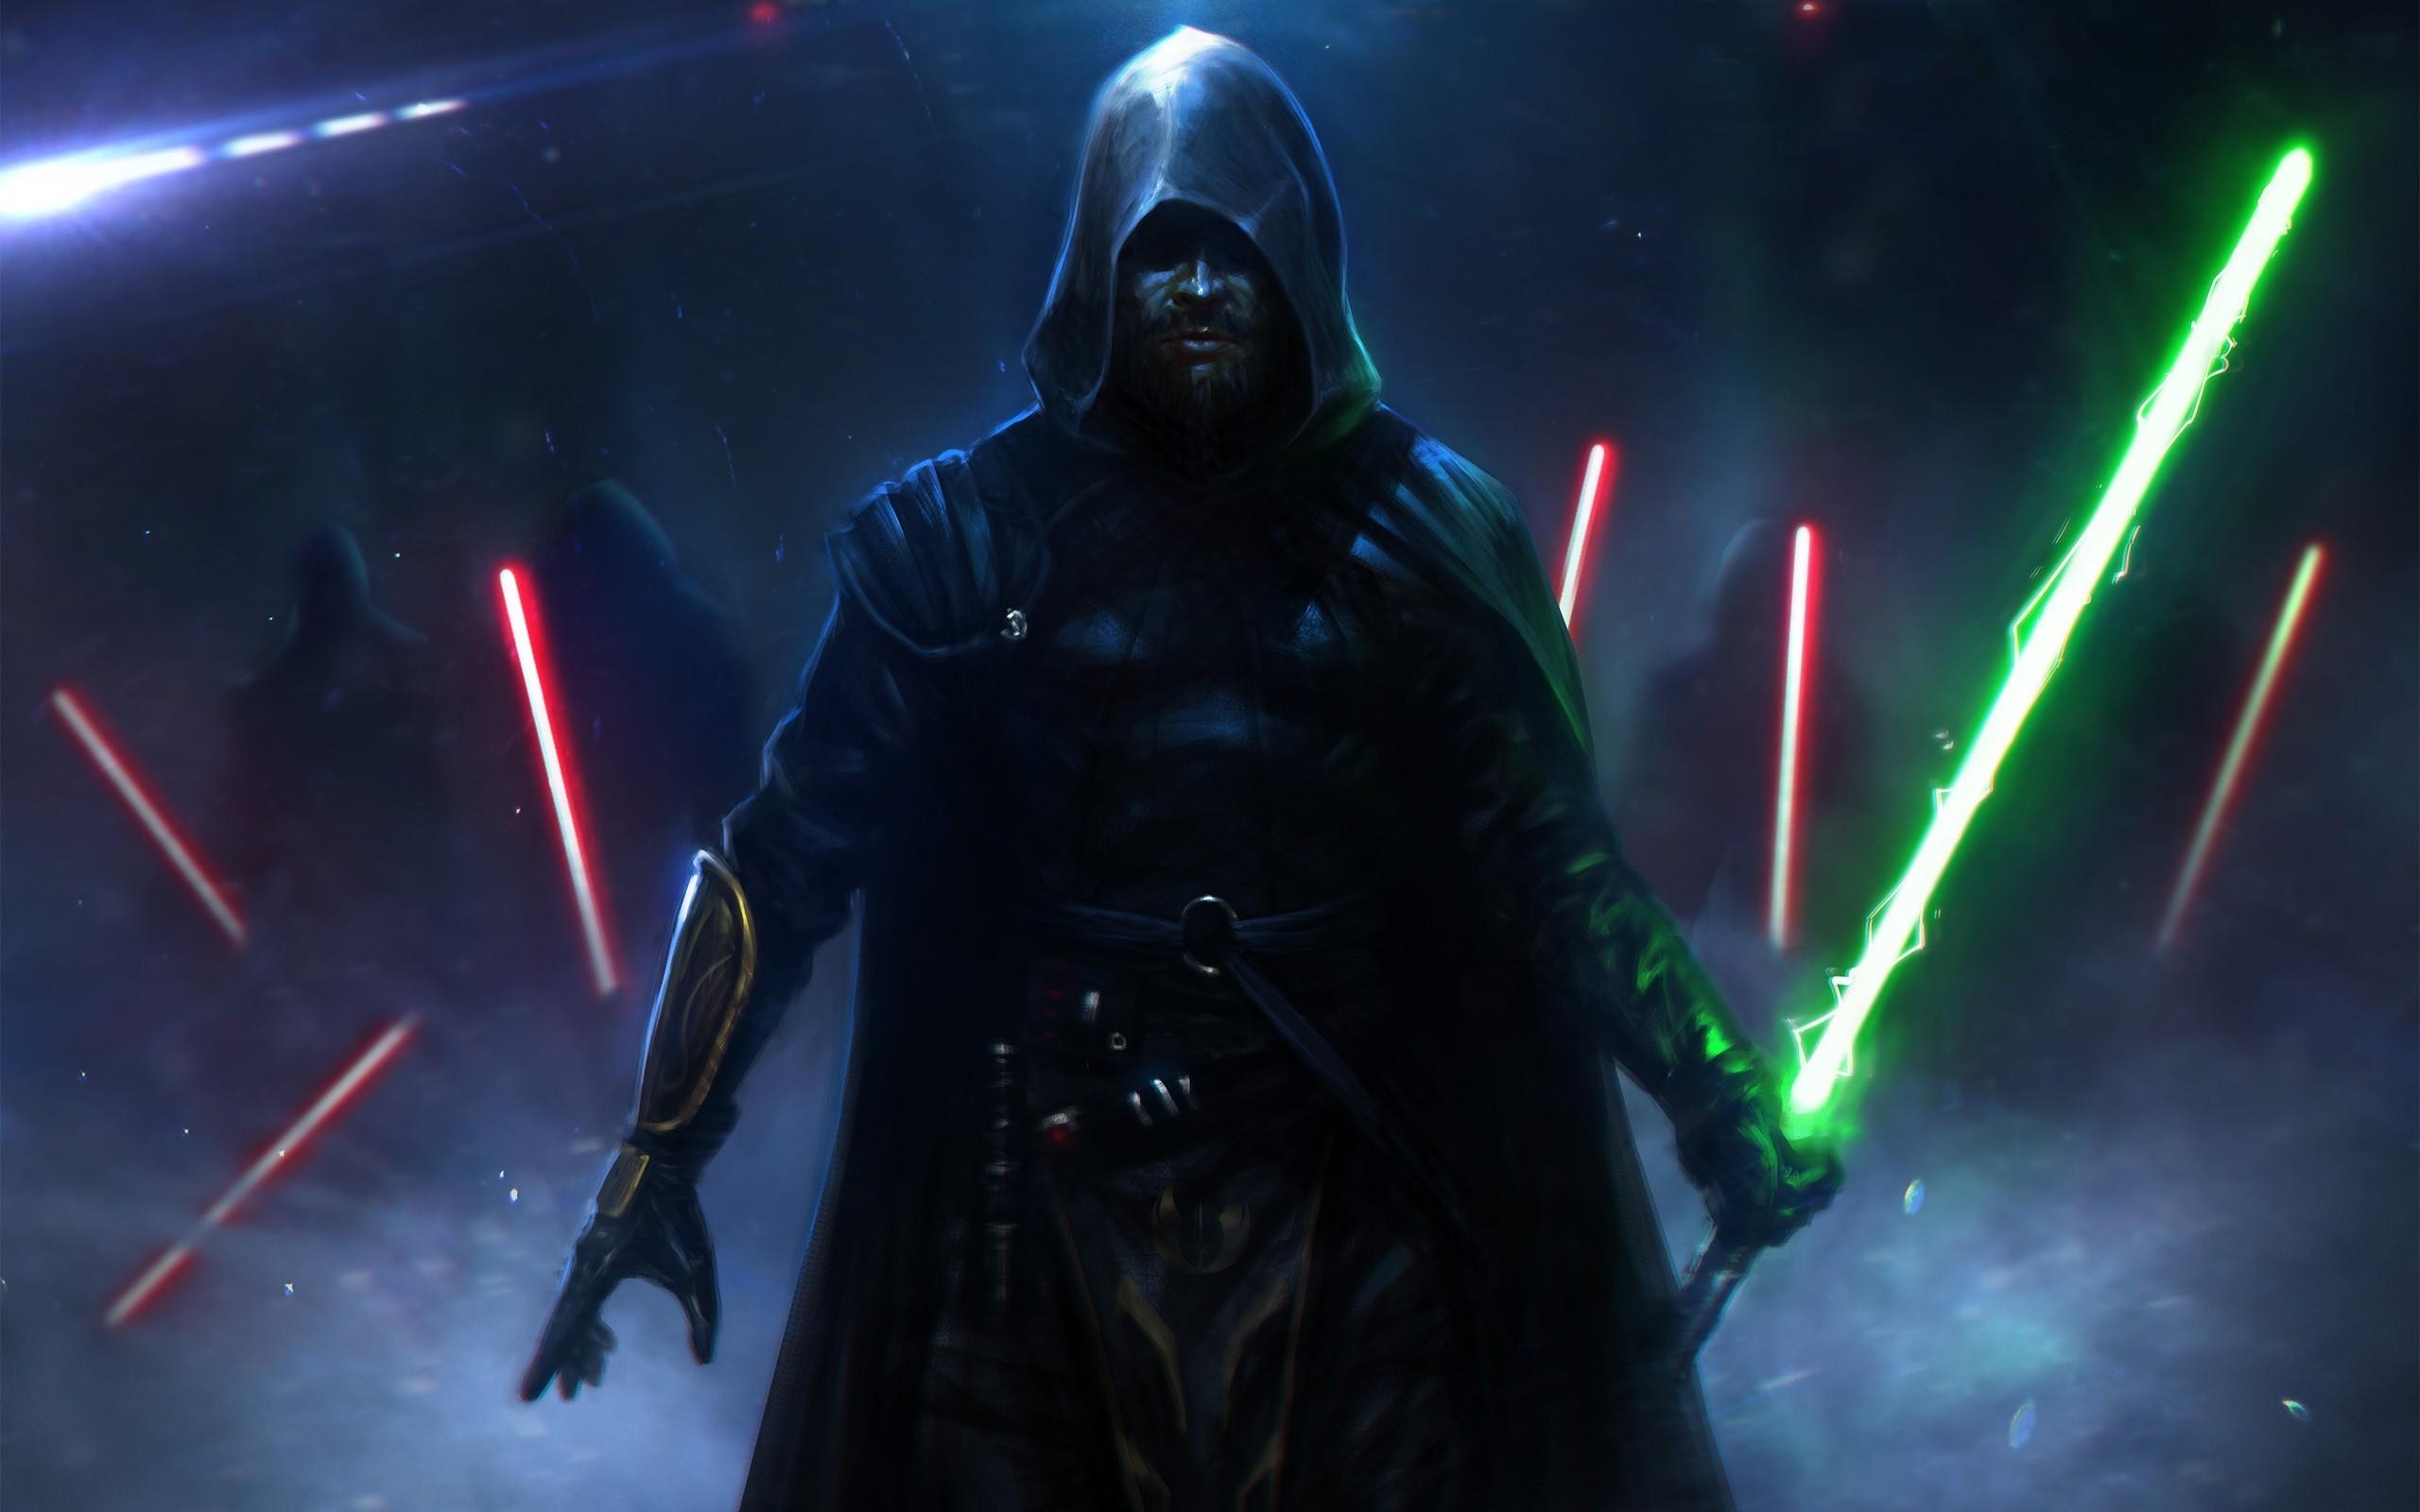 Coruscant, Star Wars, Night Wallpaper HD